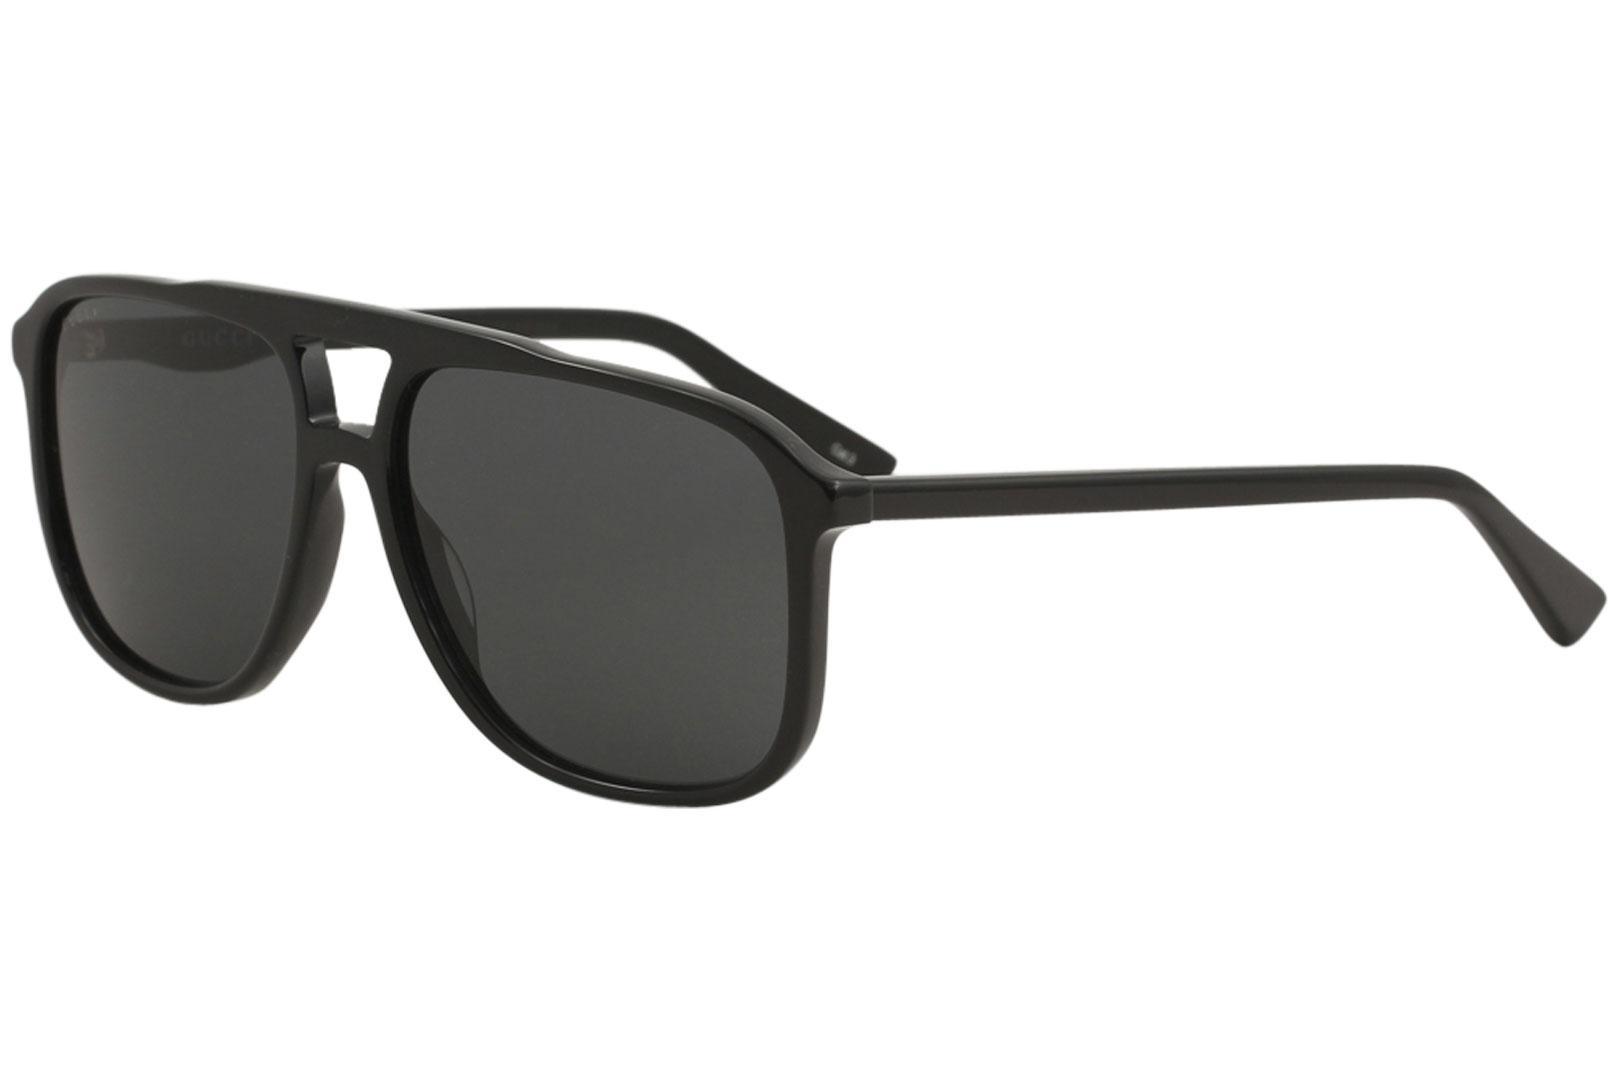 7106185afd2 Details about Gucci Men s GG0262S GG 0262 S 001 Black Grey Pilot Sunglasses  58mm